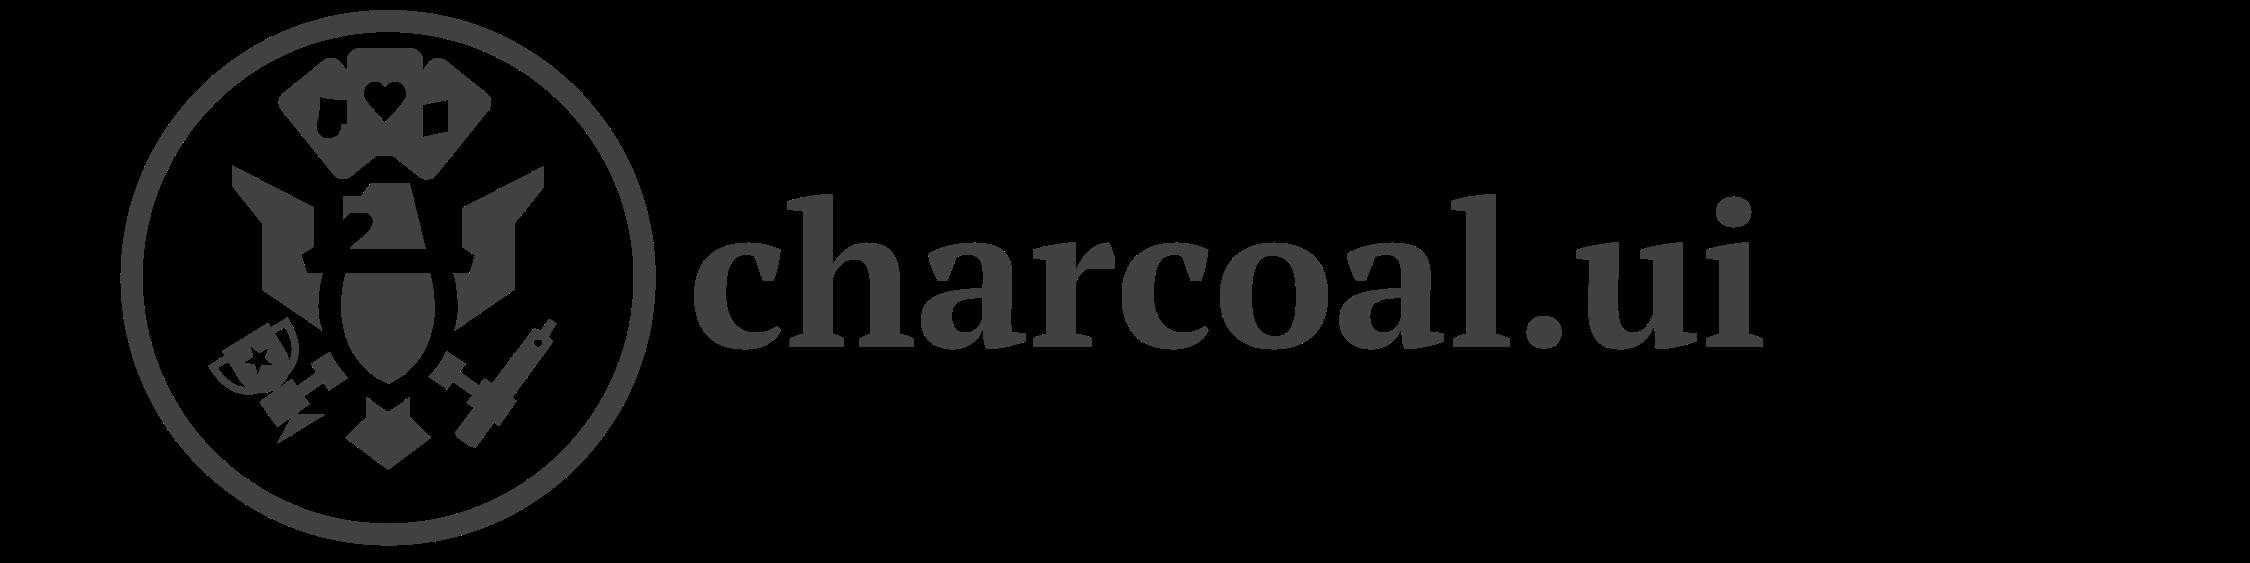 charcoal logo